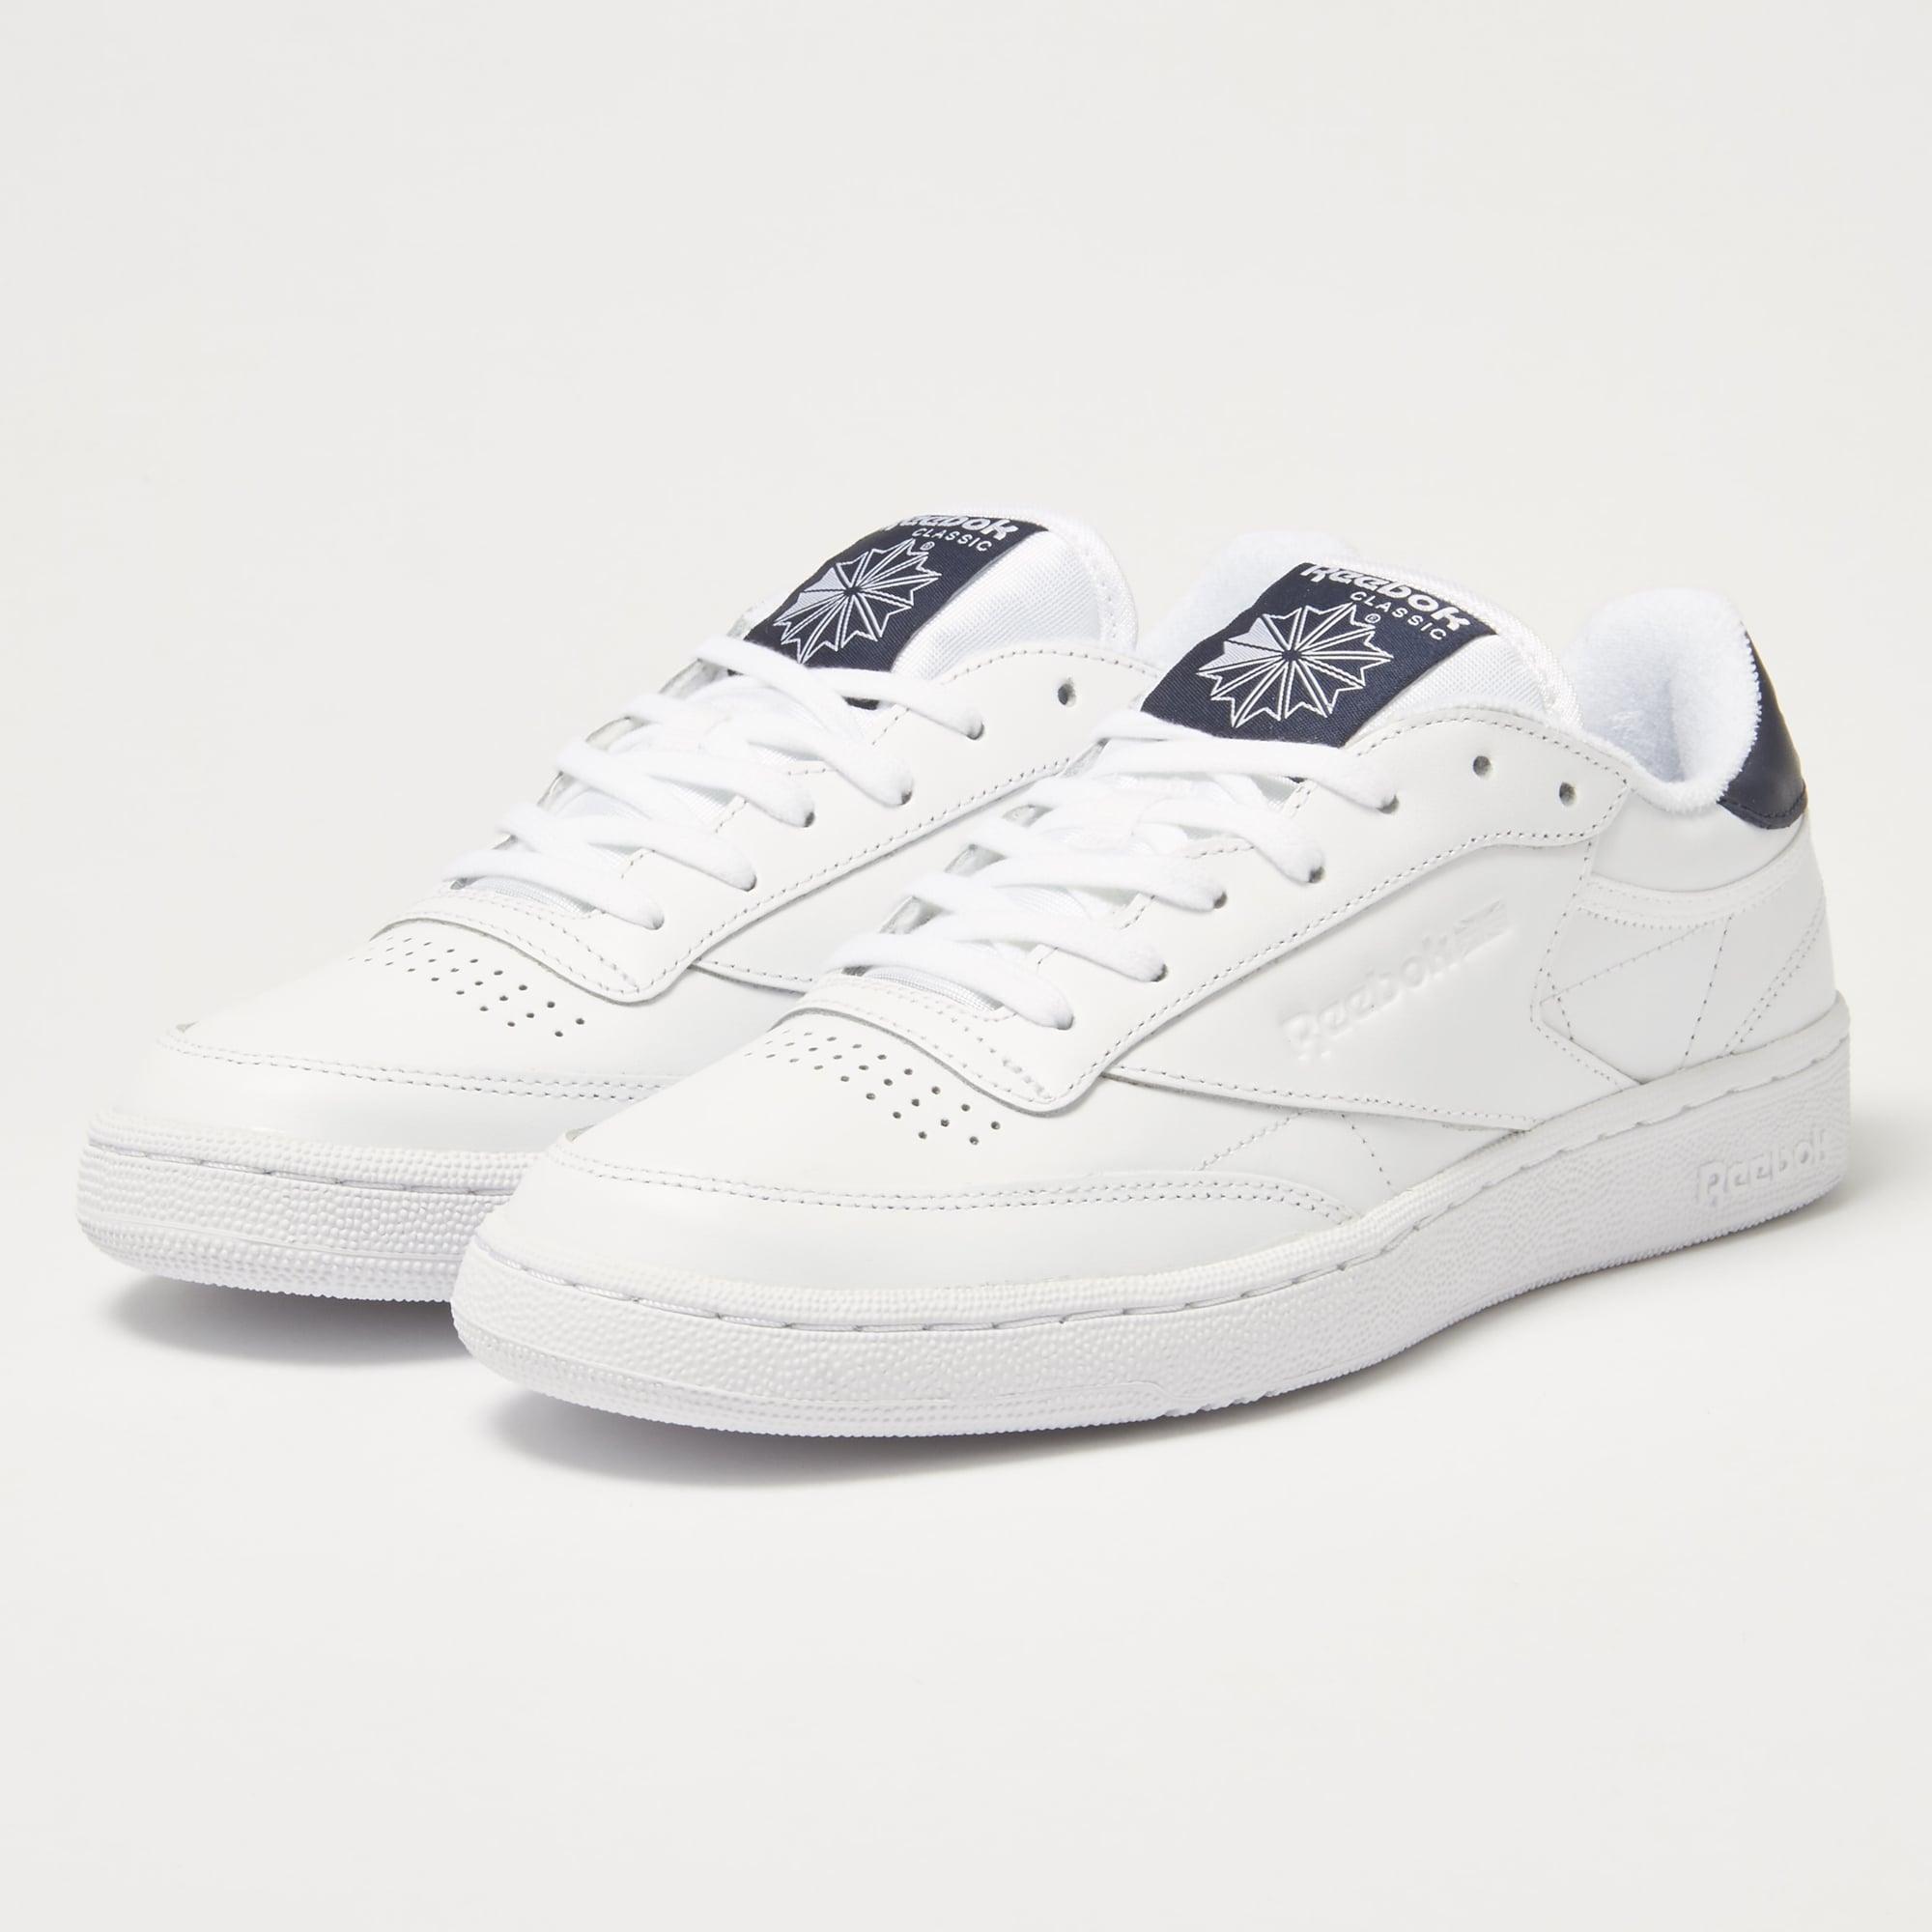 reebok uk shop club c85 el white sneakers bd5688. Black Bedroom Furniture Sets. Home Design Ideas